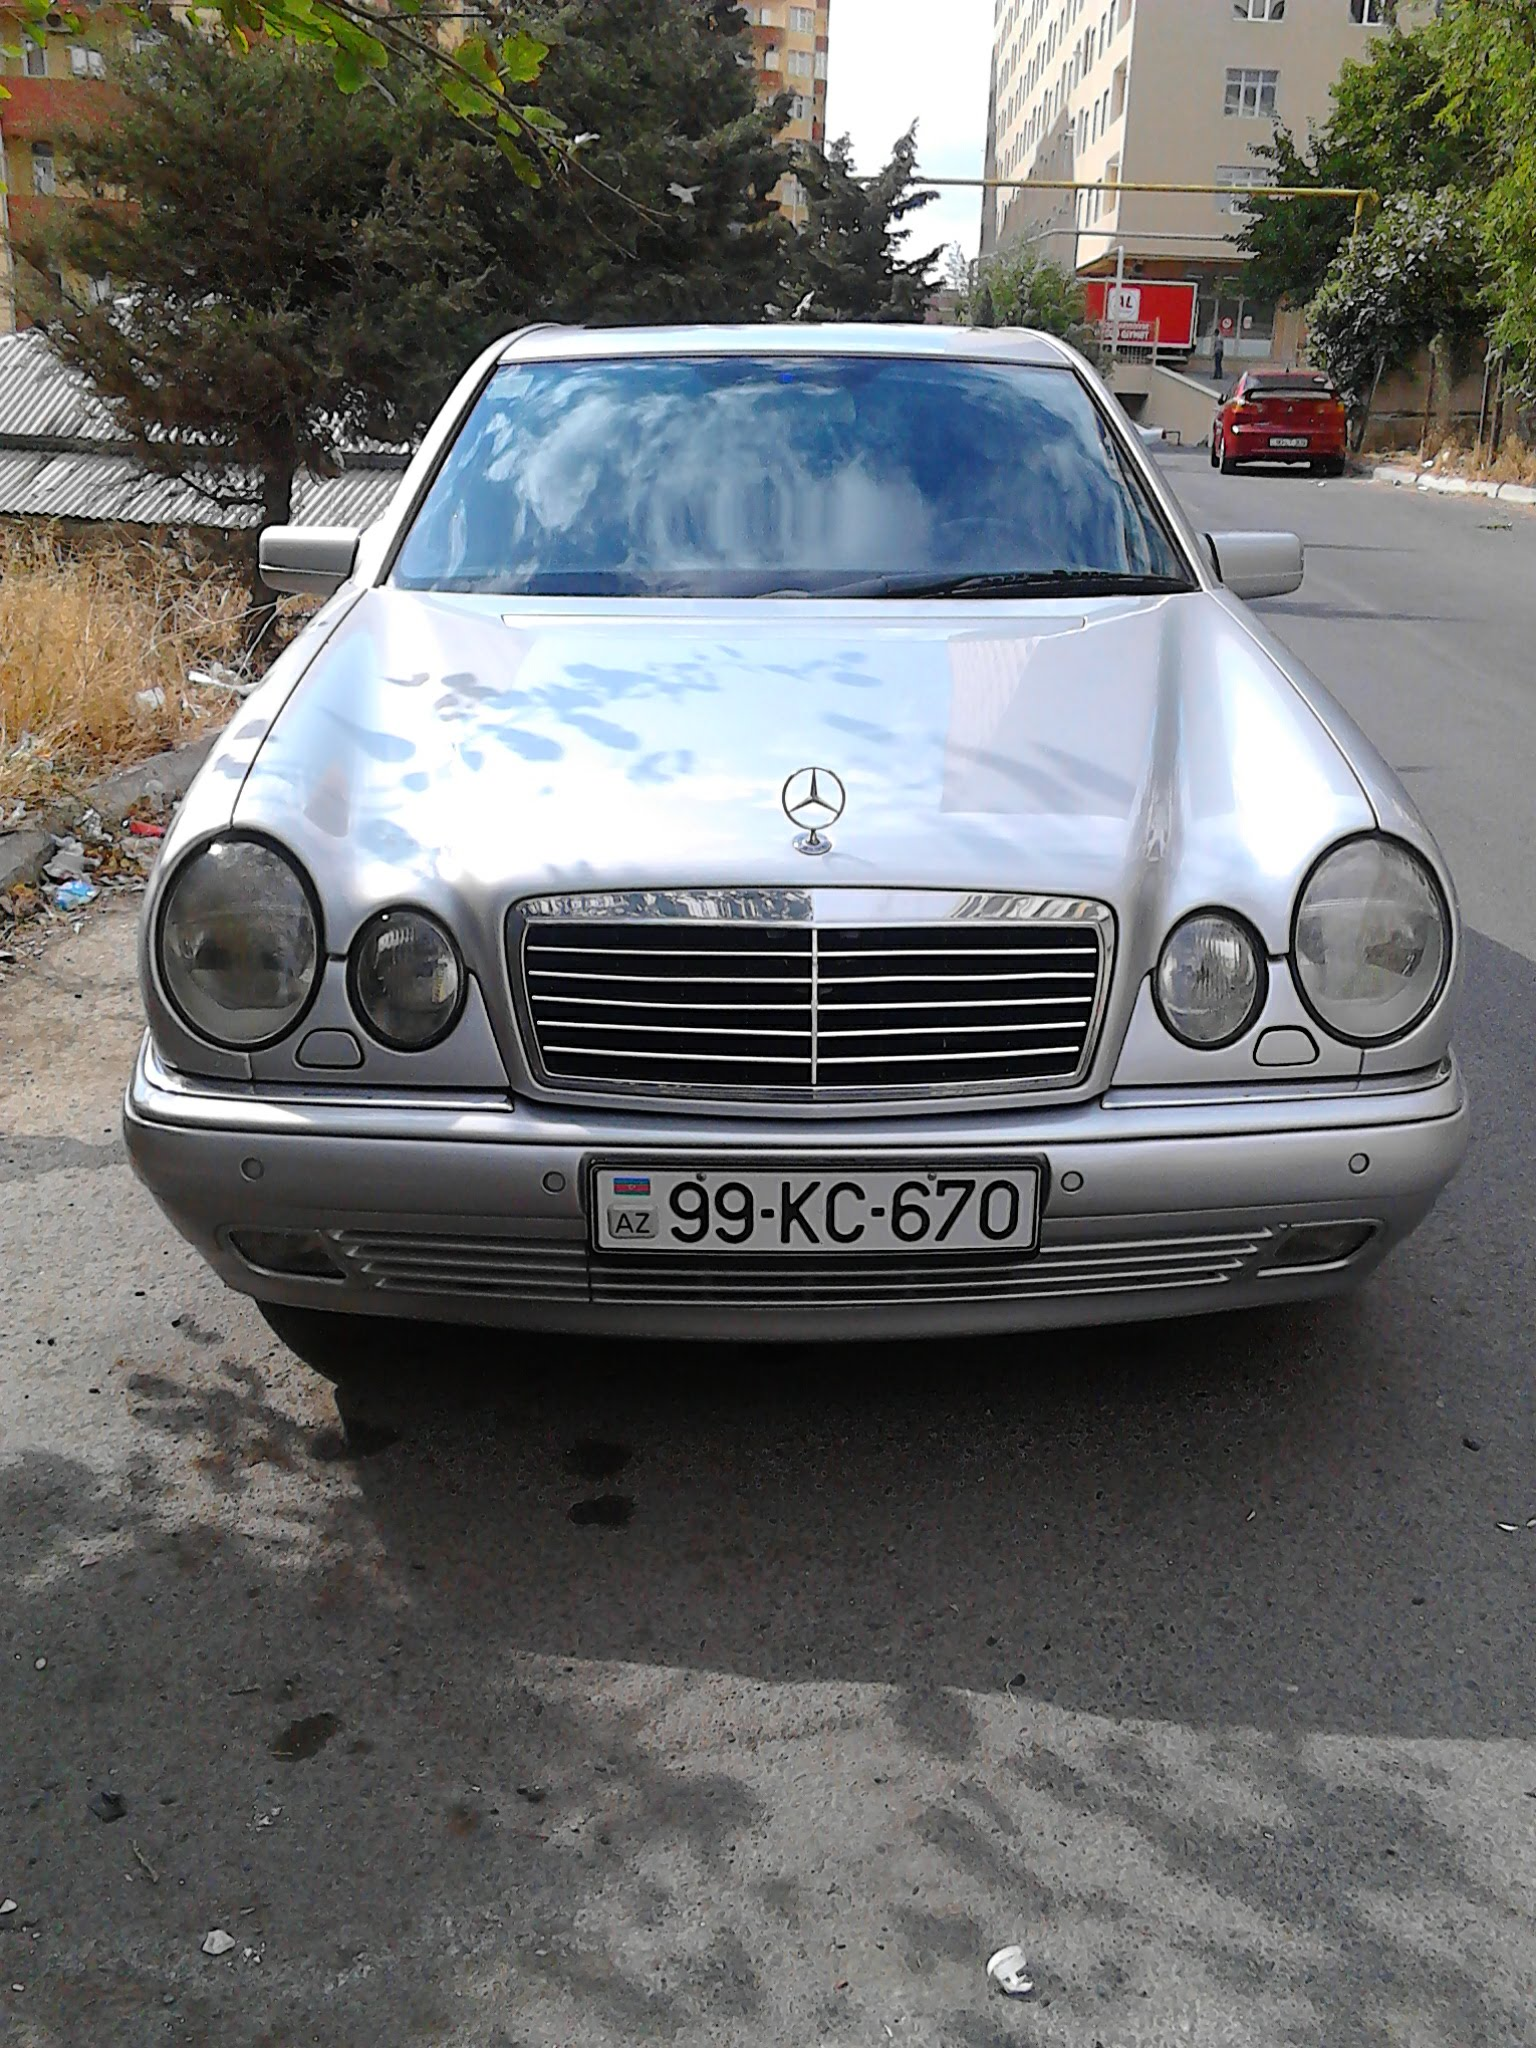 Mercedes-Benz E 280 2.8(lt) 1998 İkinci əl  $7300